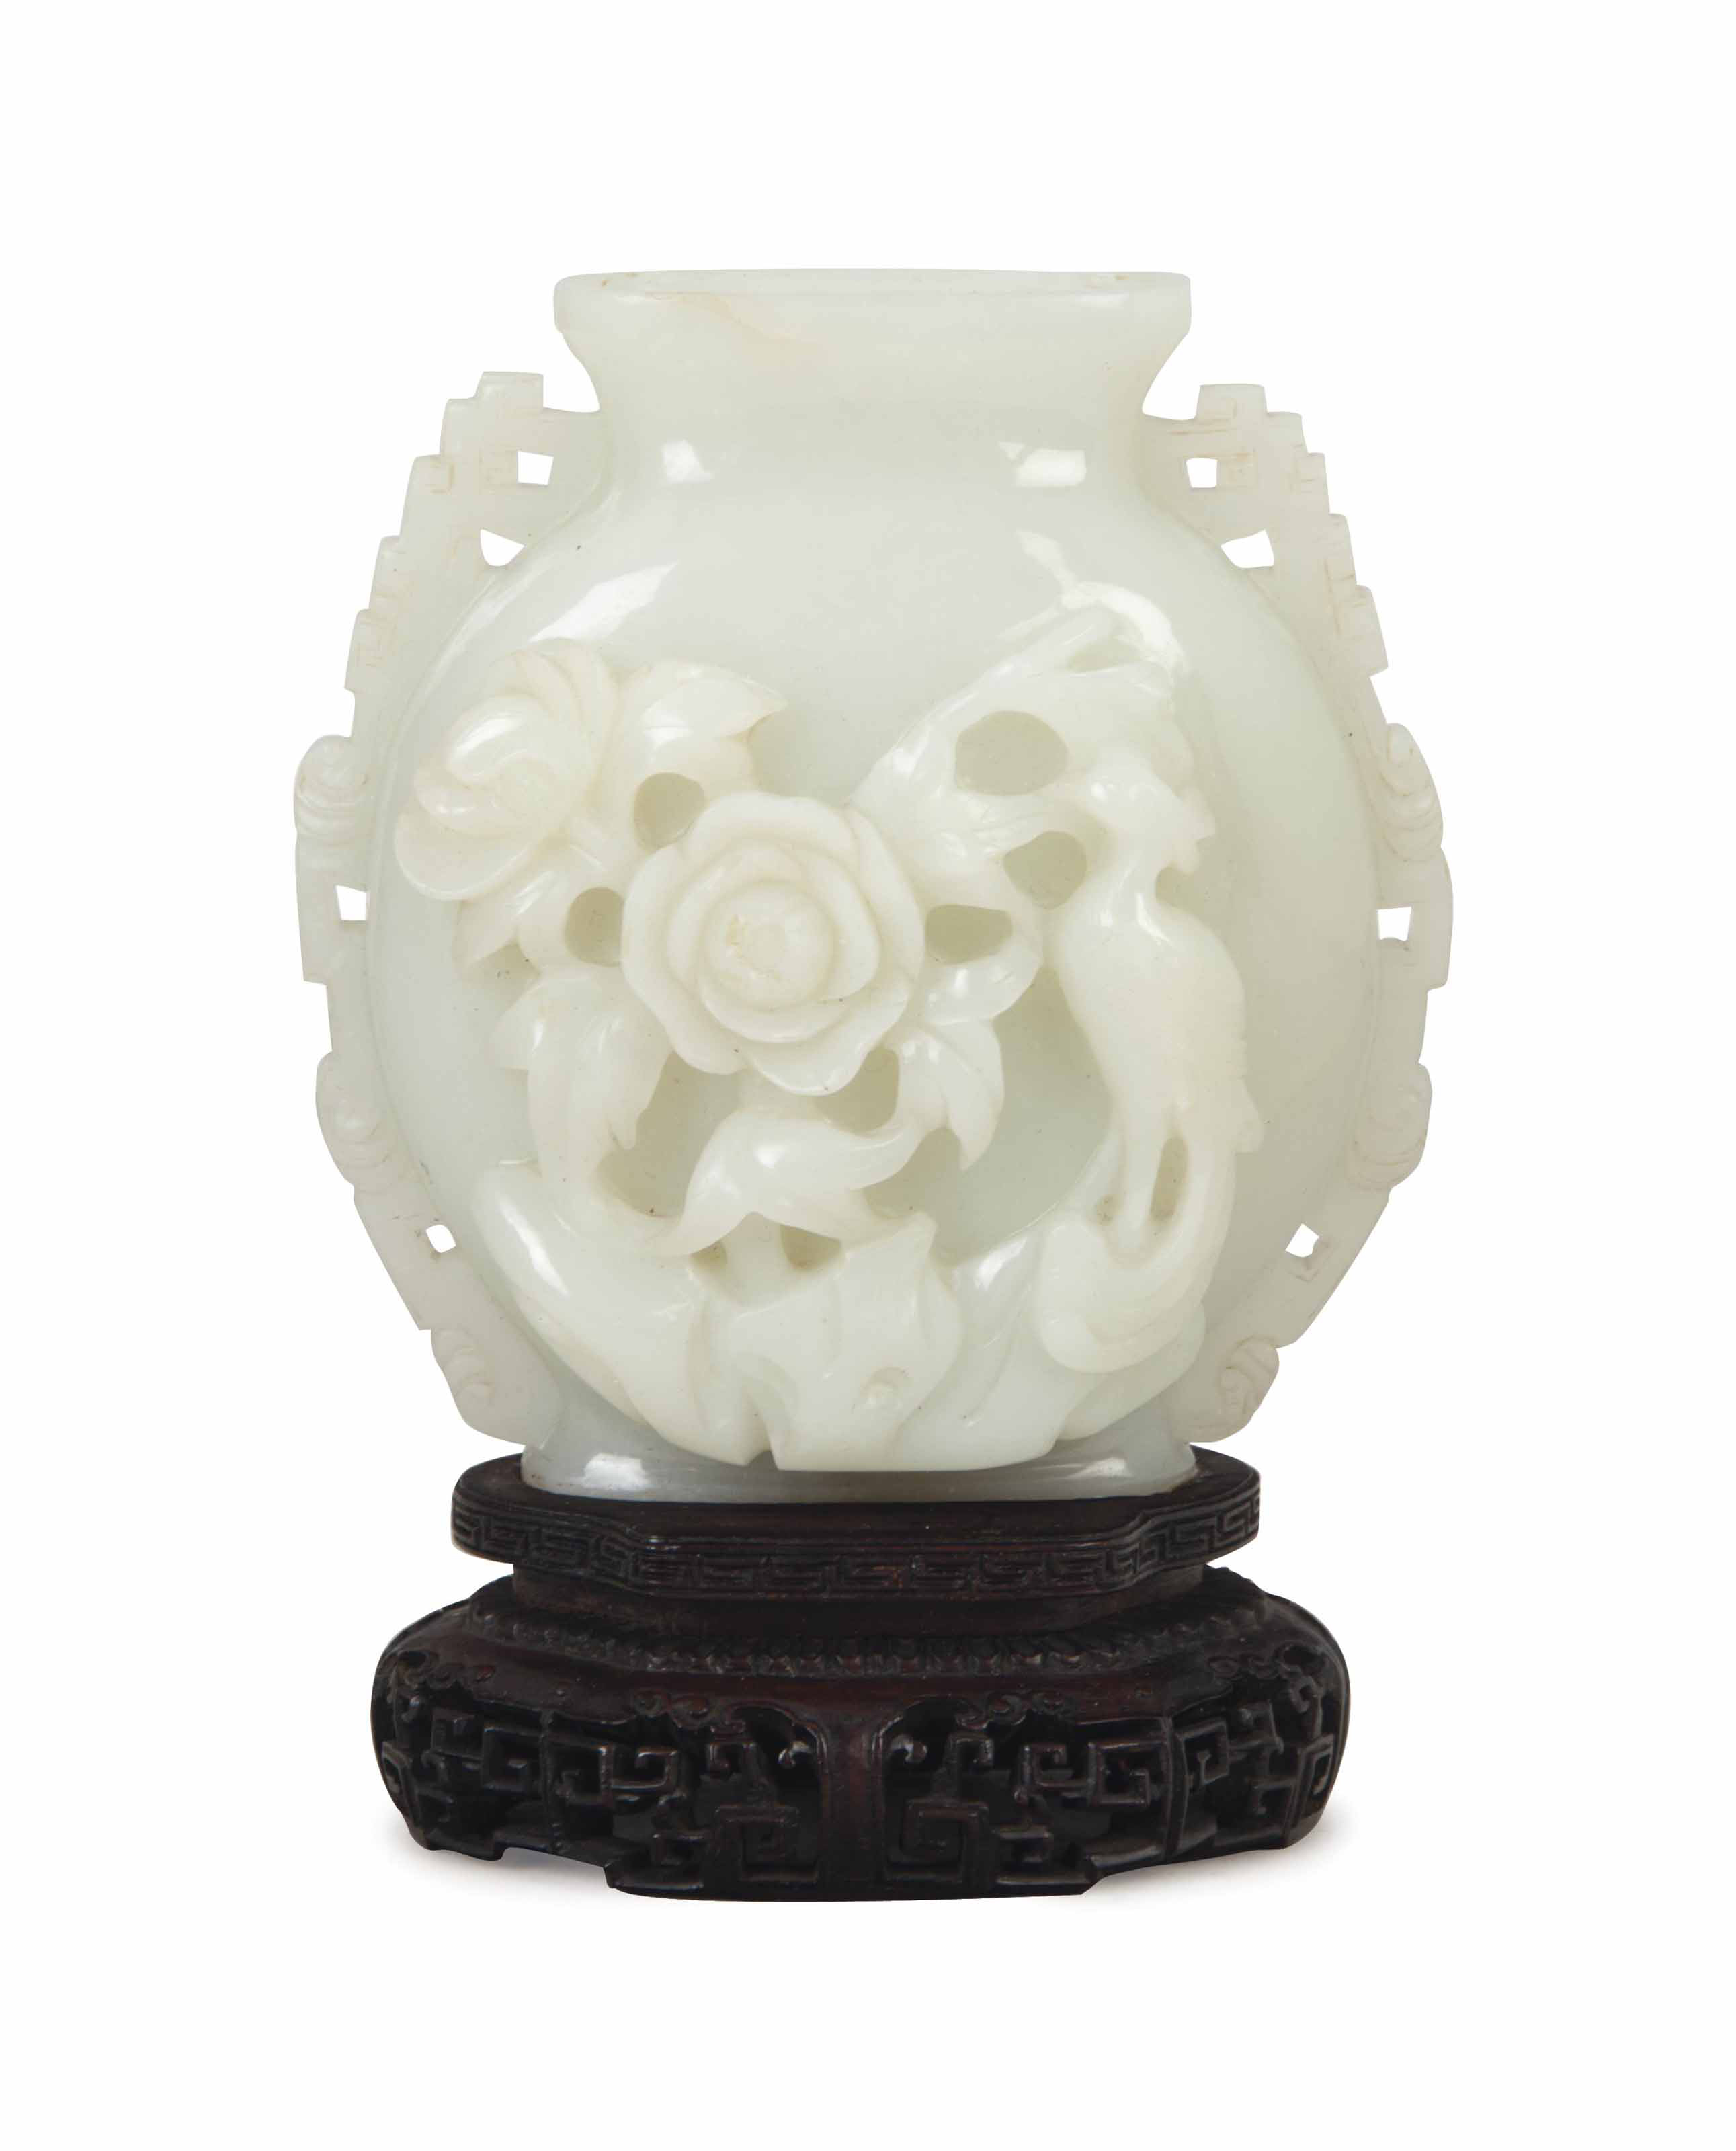 A CHINESE WHITE JADE VASE,